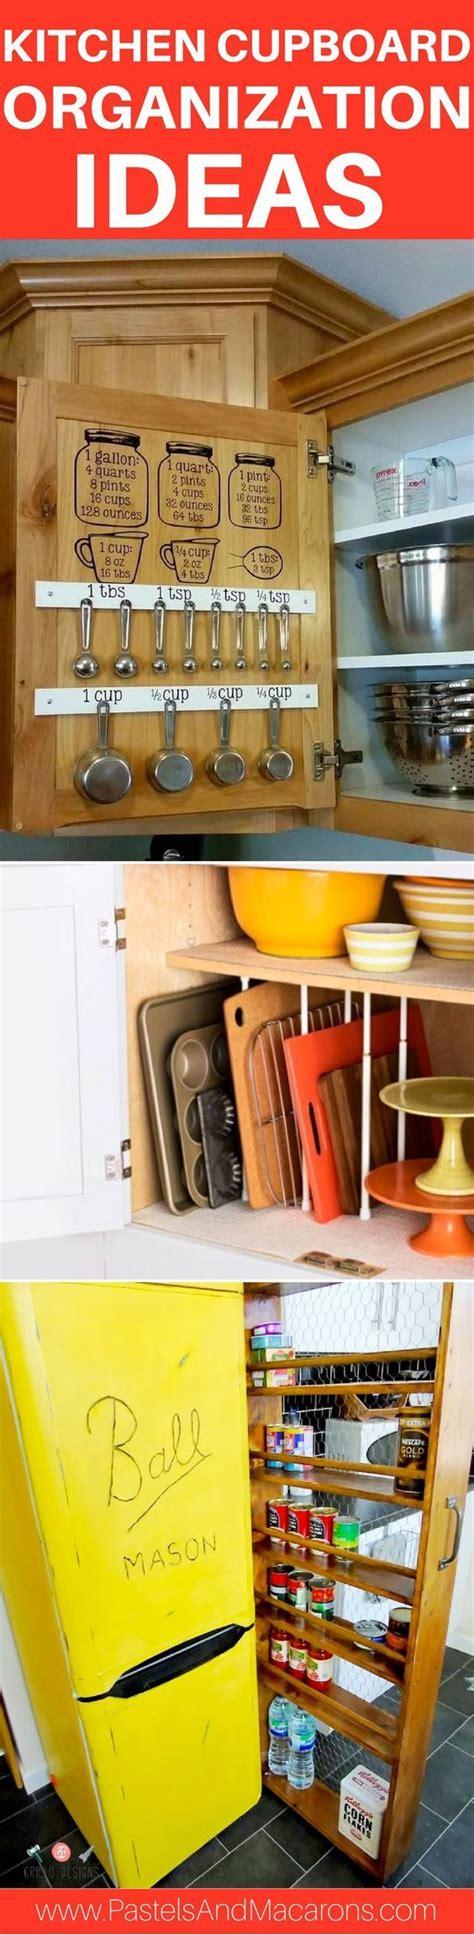 awesome kitchen cupboard organization ideas